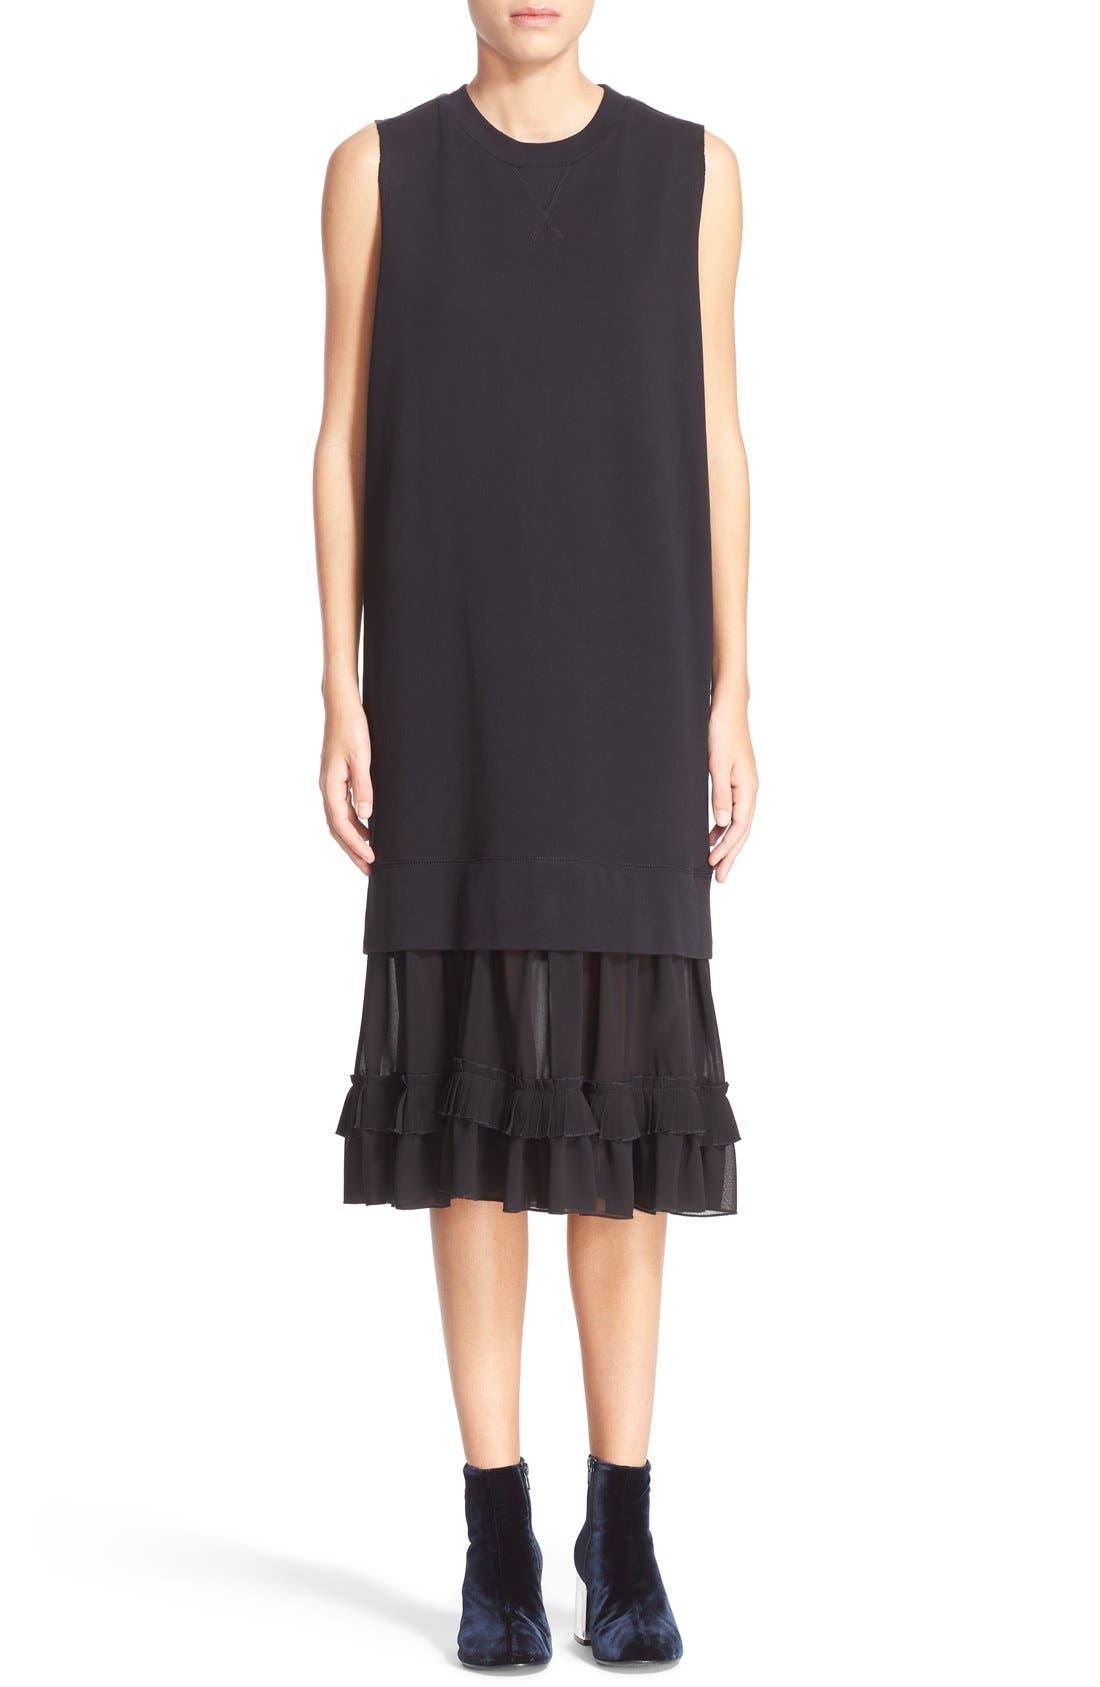 Alternate Image 1 Selected - MM6 Maison Margiela Chiffon Hem Sweatshirt Dress